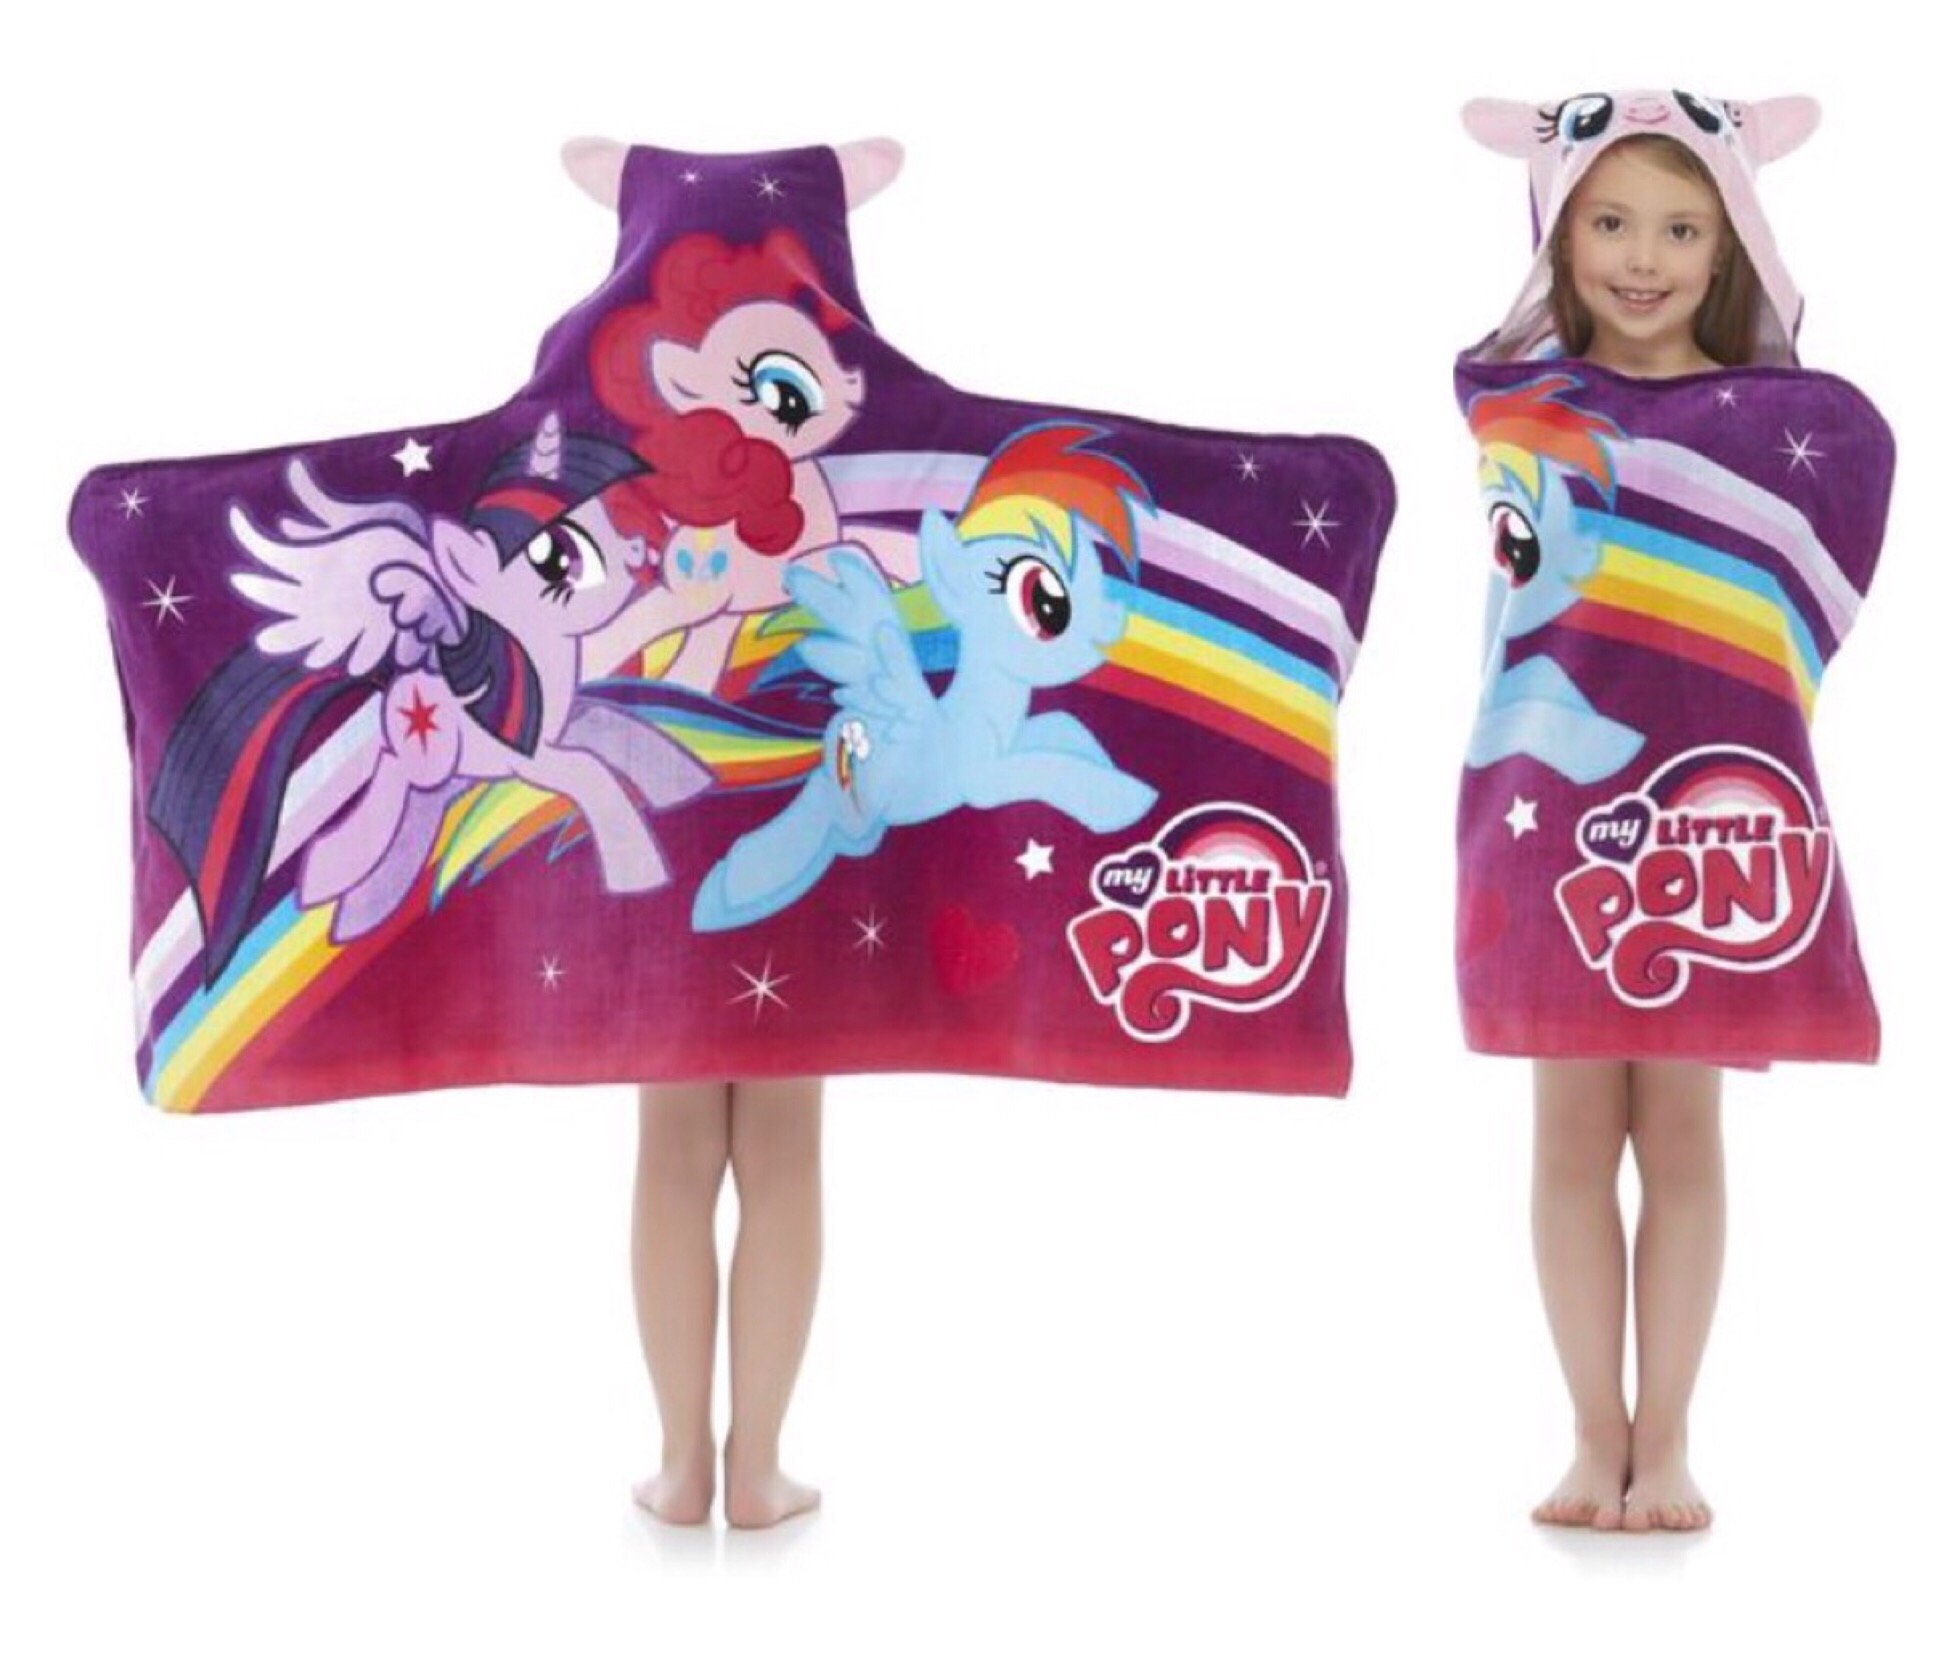 My Little Pony Hooded Beach Bath Towel Wrap - Kids